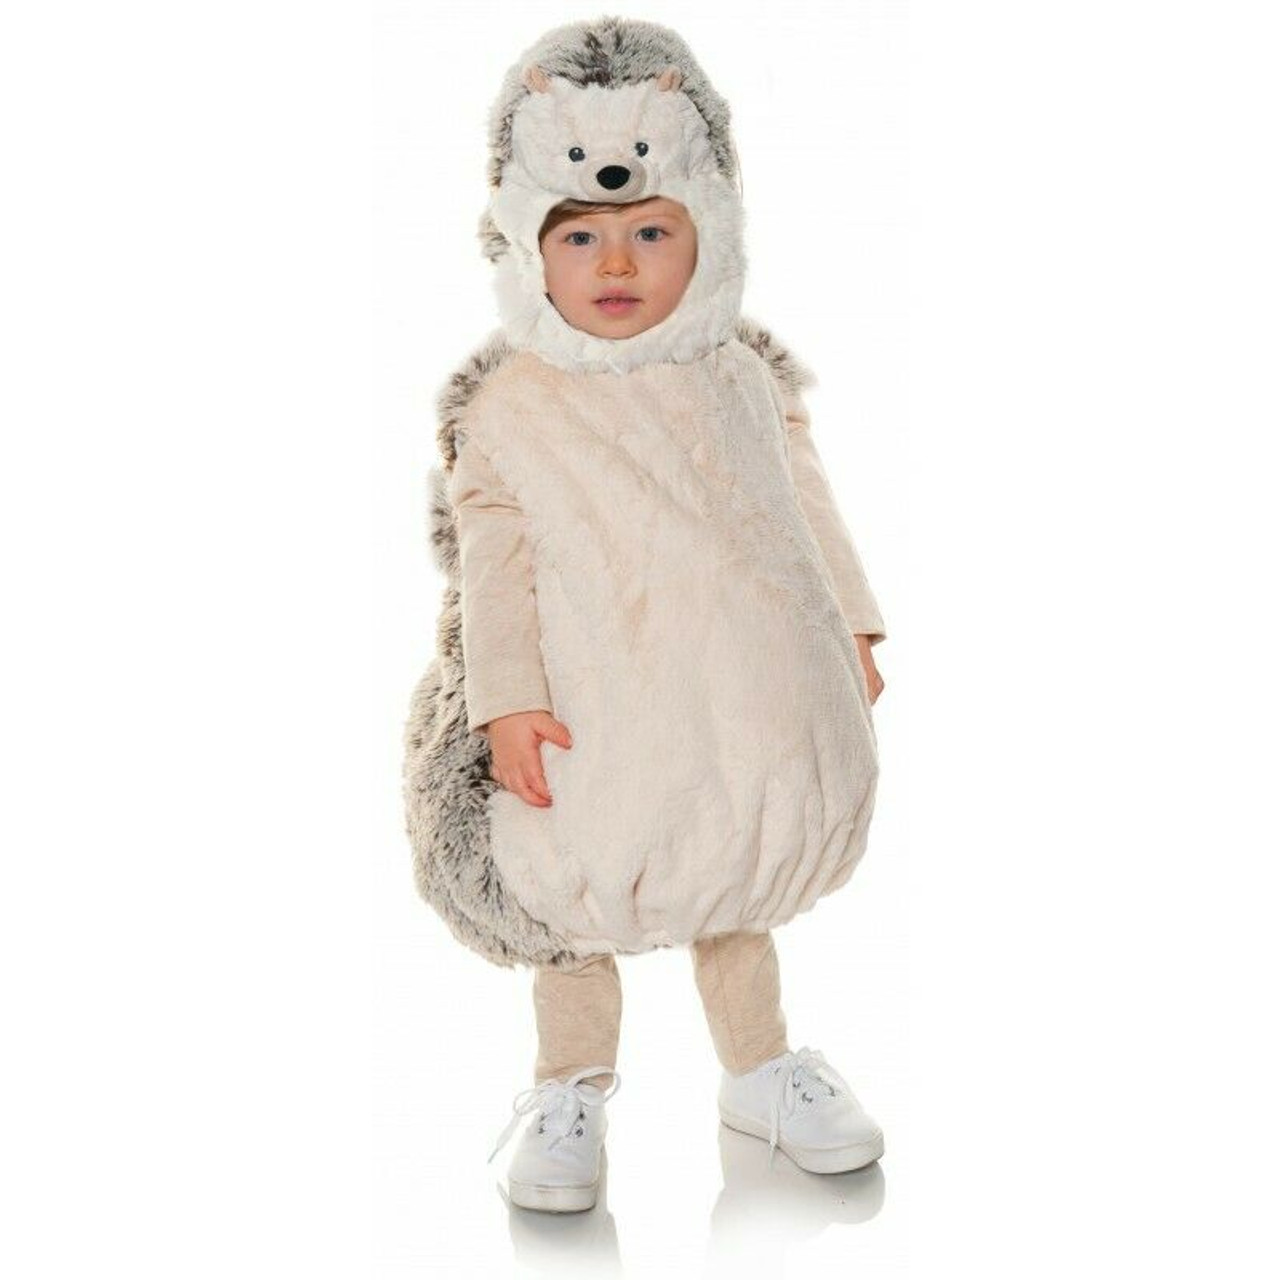 Underwraps Walrus Belly Babies Plush Animals Toddlers Halloween Costume 27563